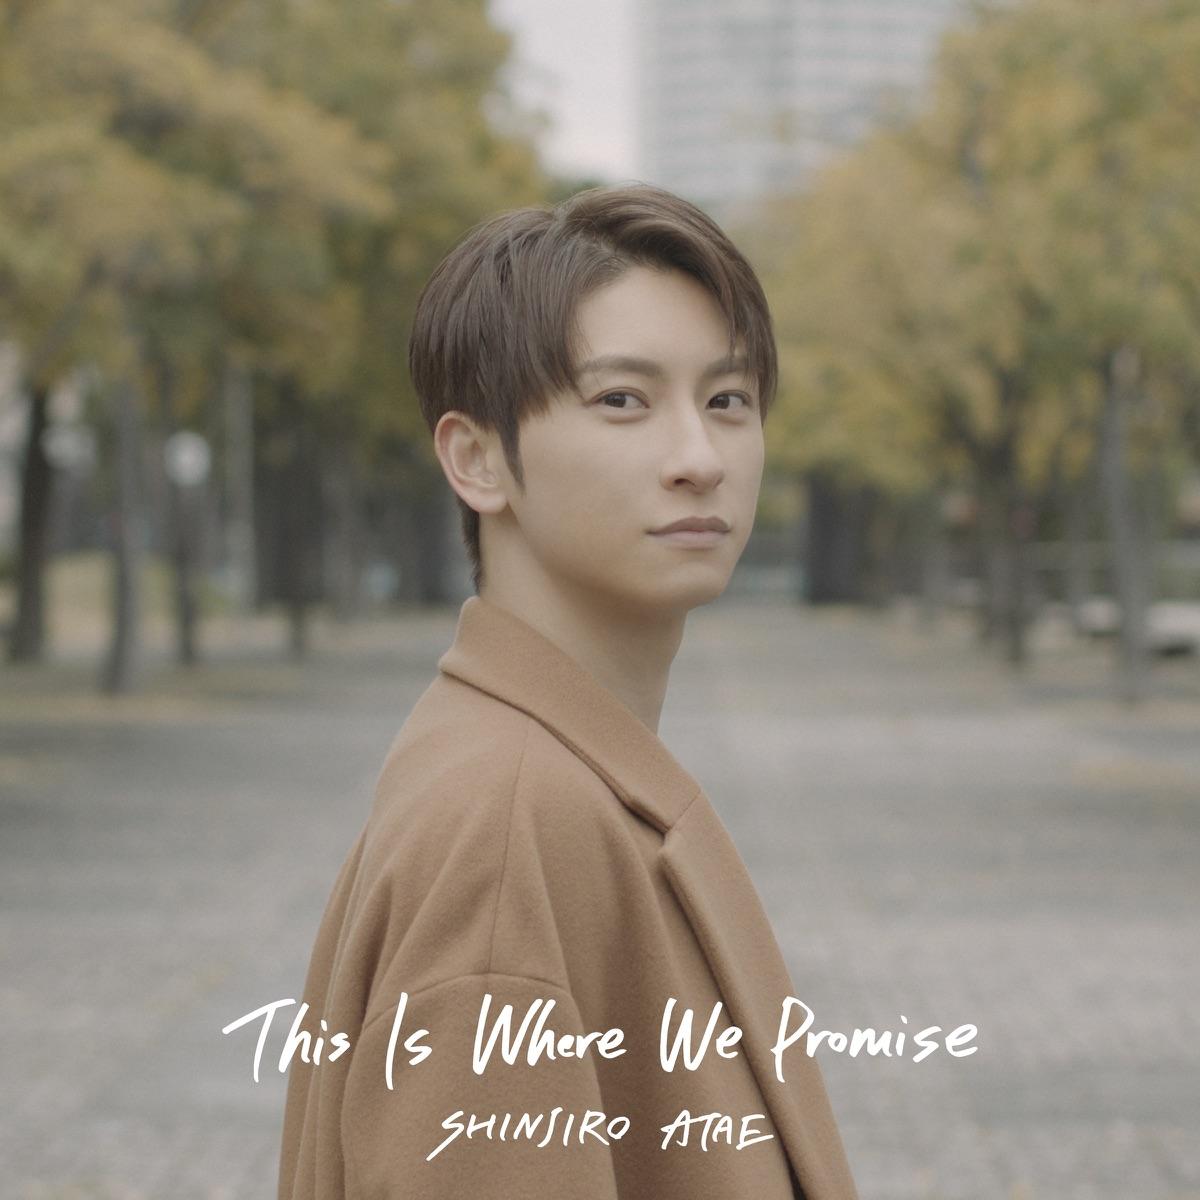 『SHINJIRO ATAE (from AAA) - This Is Where We Promise』収録の『This Is Where We Promise』ジャケット